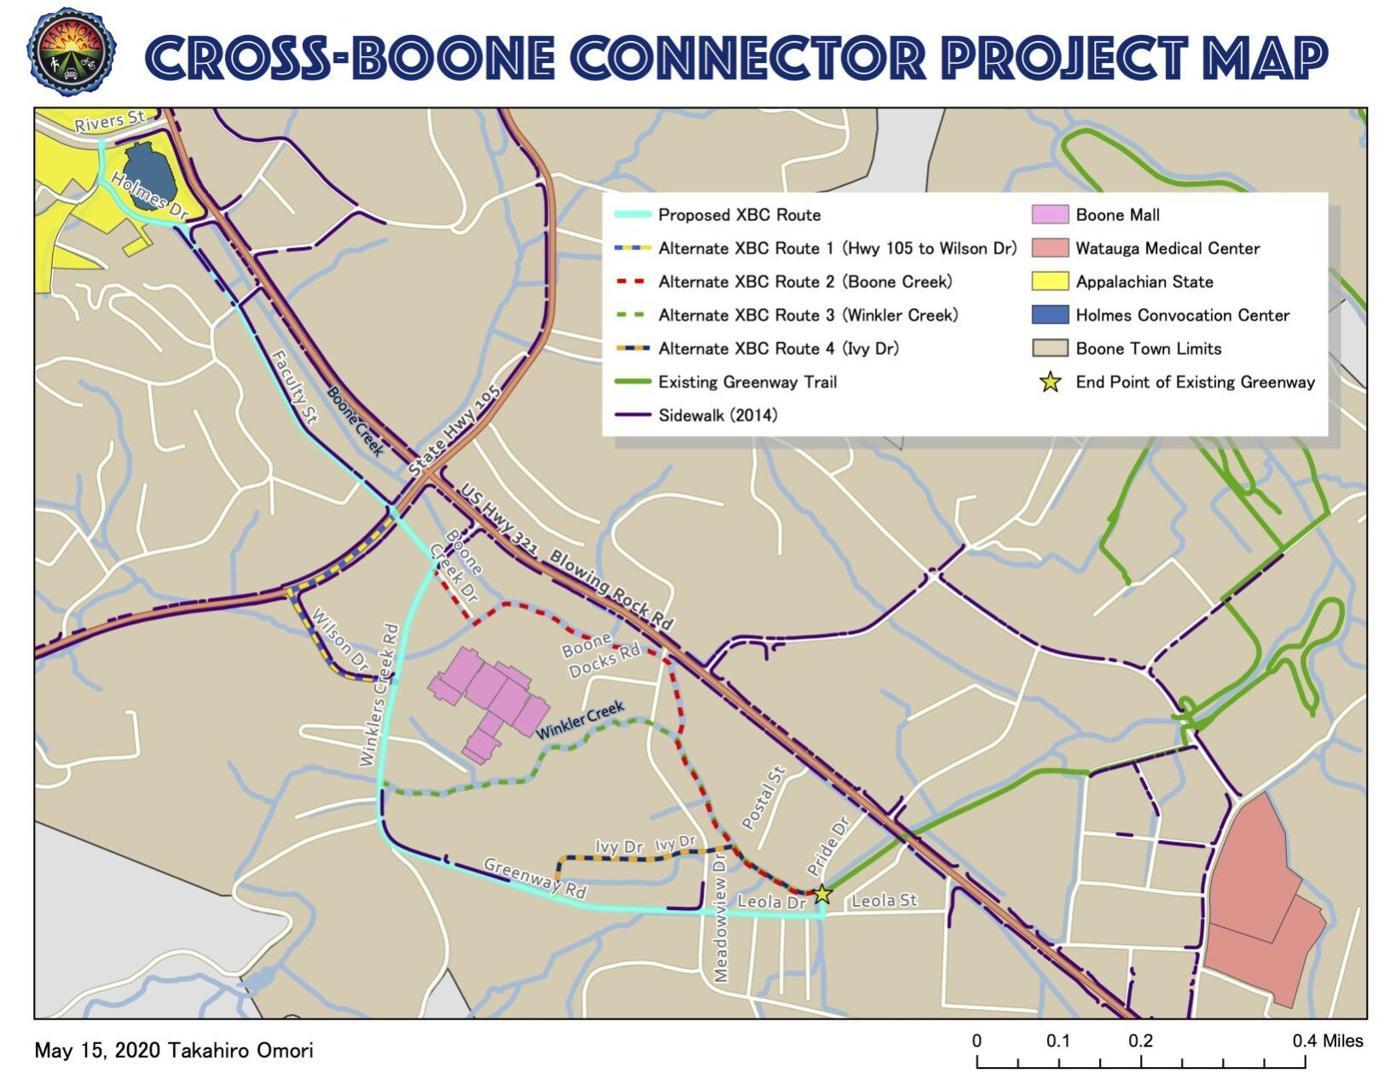 Cross Boone Connector